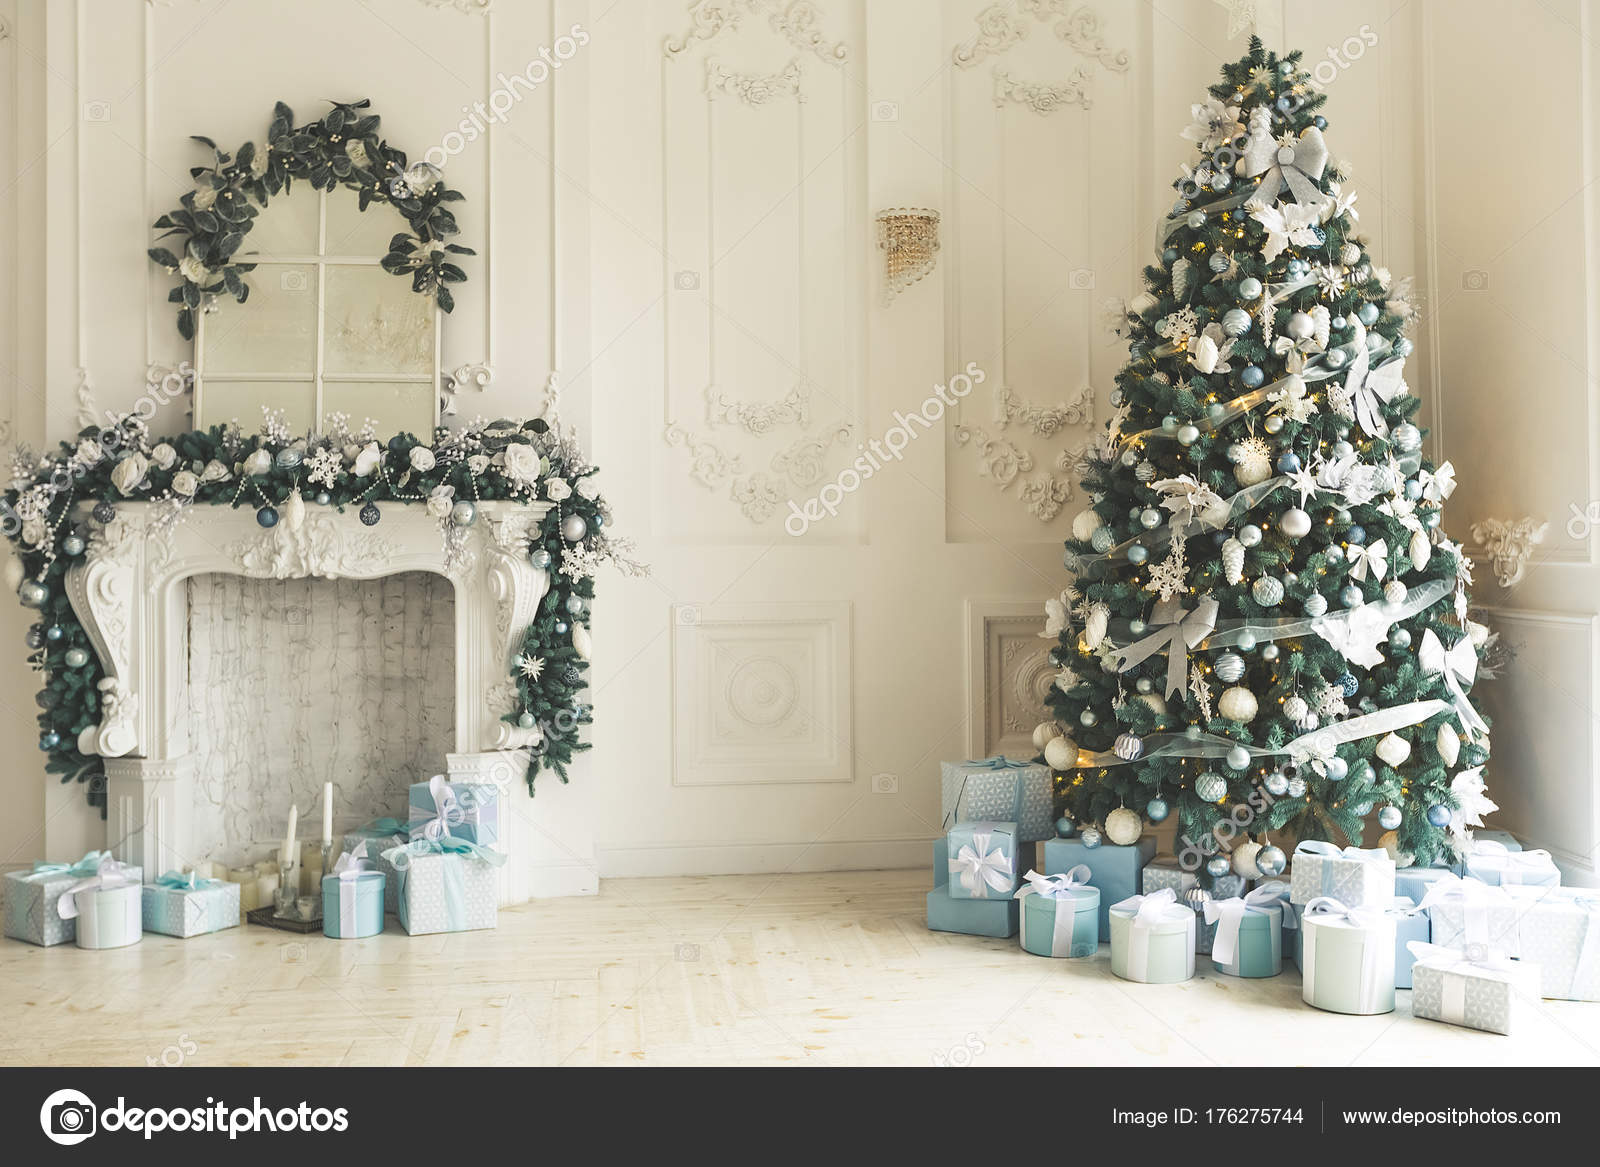 Christmas Living Room Christmas Tree Fireplace Gifts Large Window ...